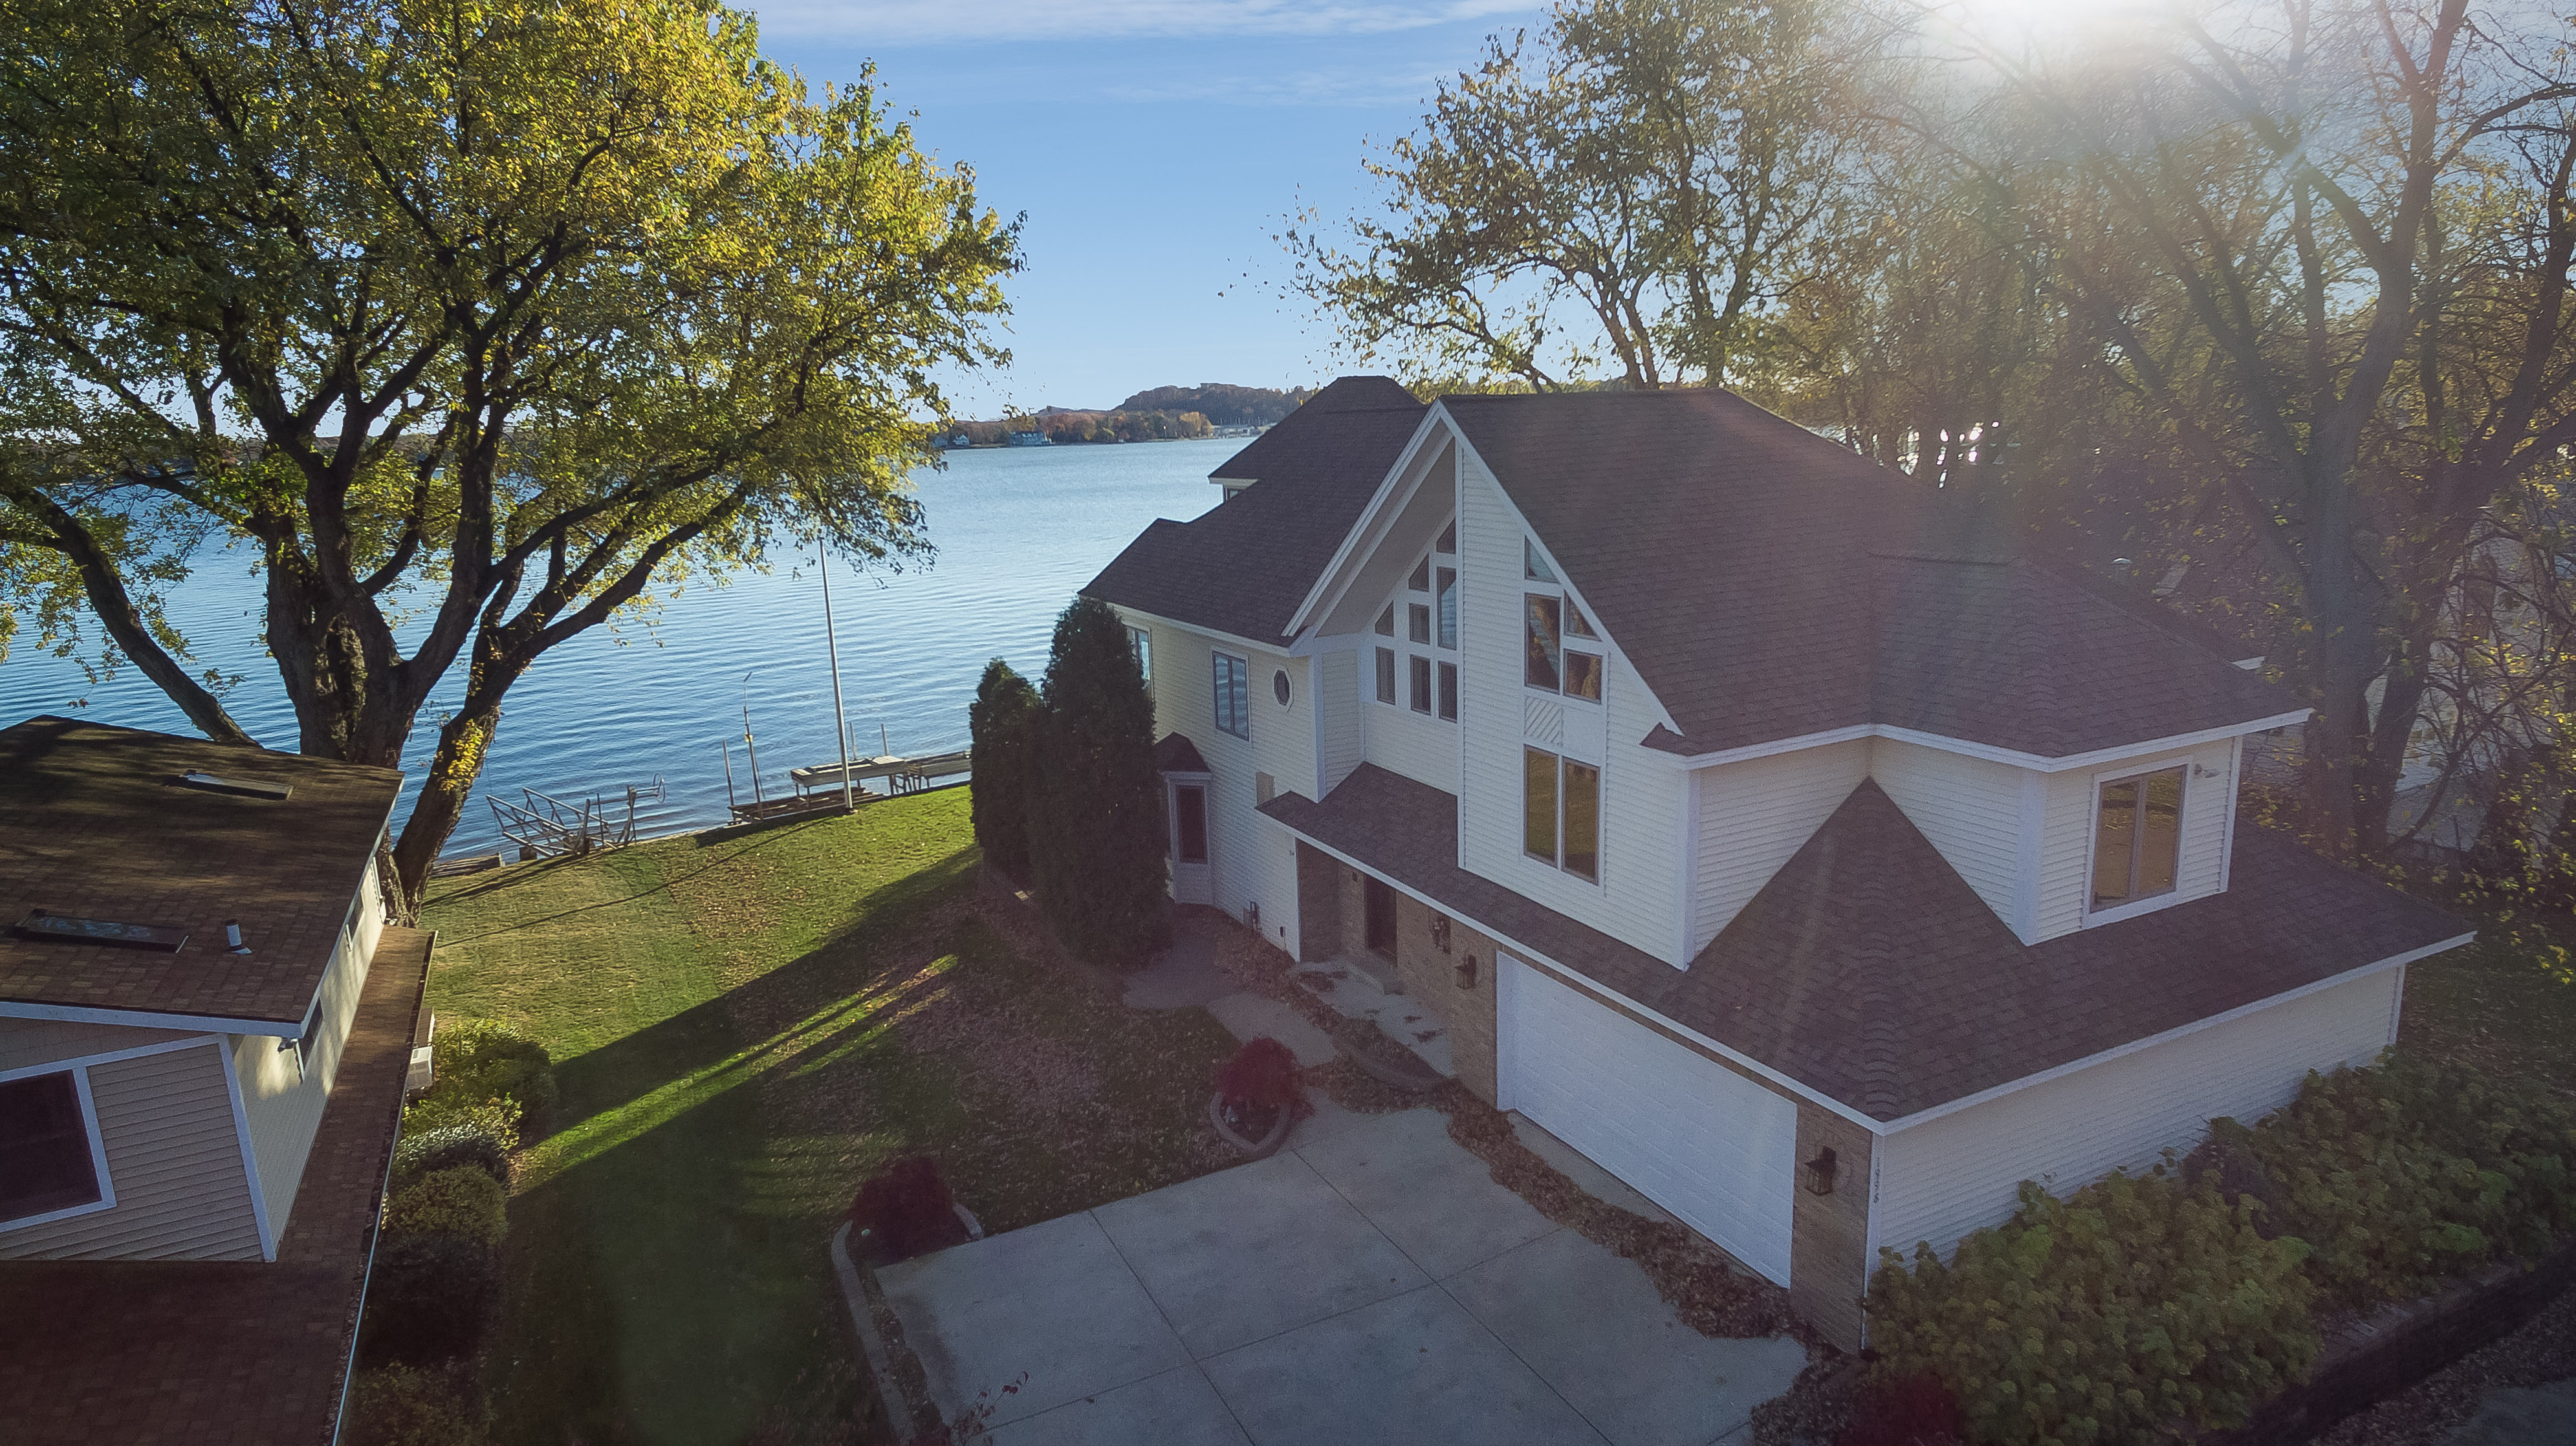 独户住宅 为 销售 在 Custom Home Built With Spectacular Views Of Lake Macatawa 1998 Lake Street 霍德兰, 密歇根州, 49424 美国